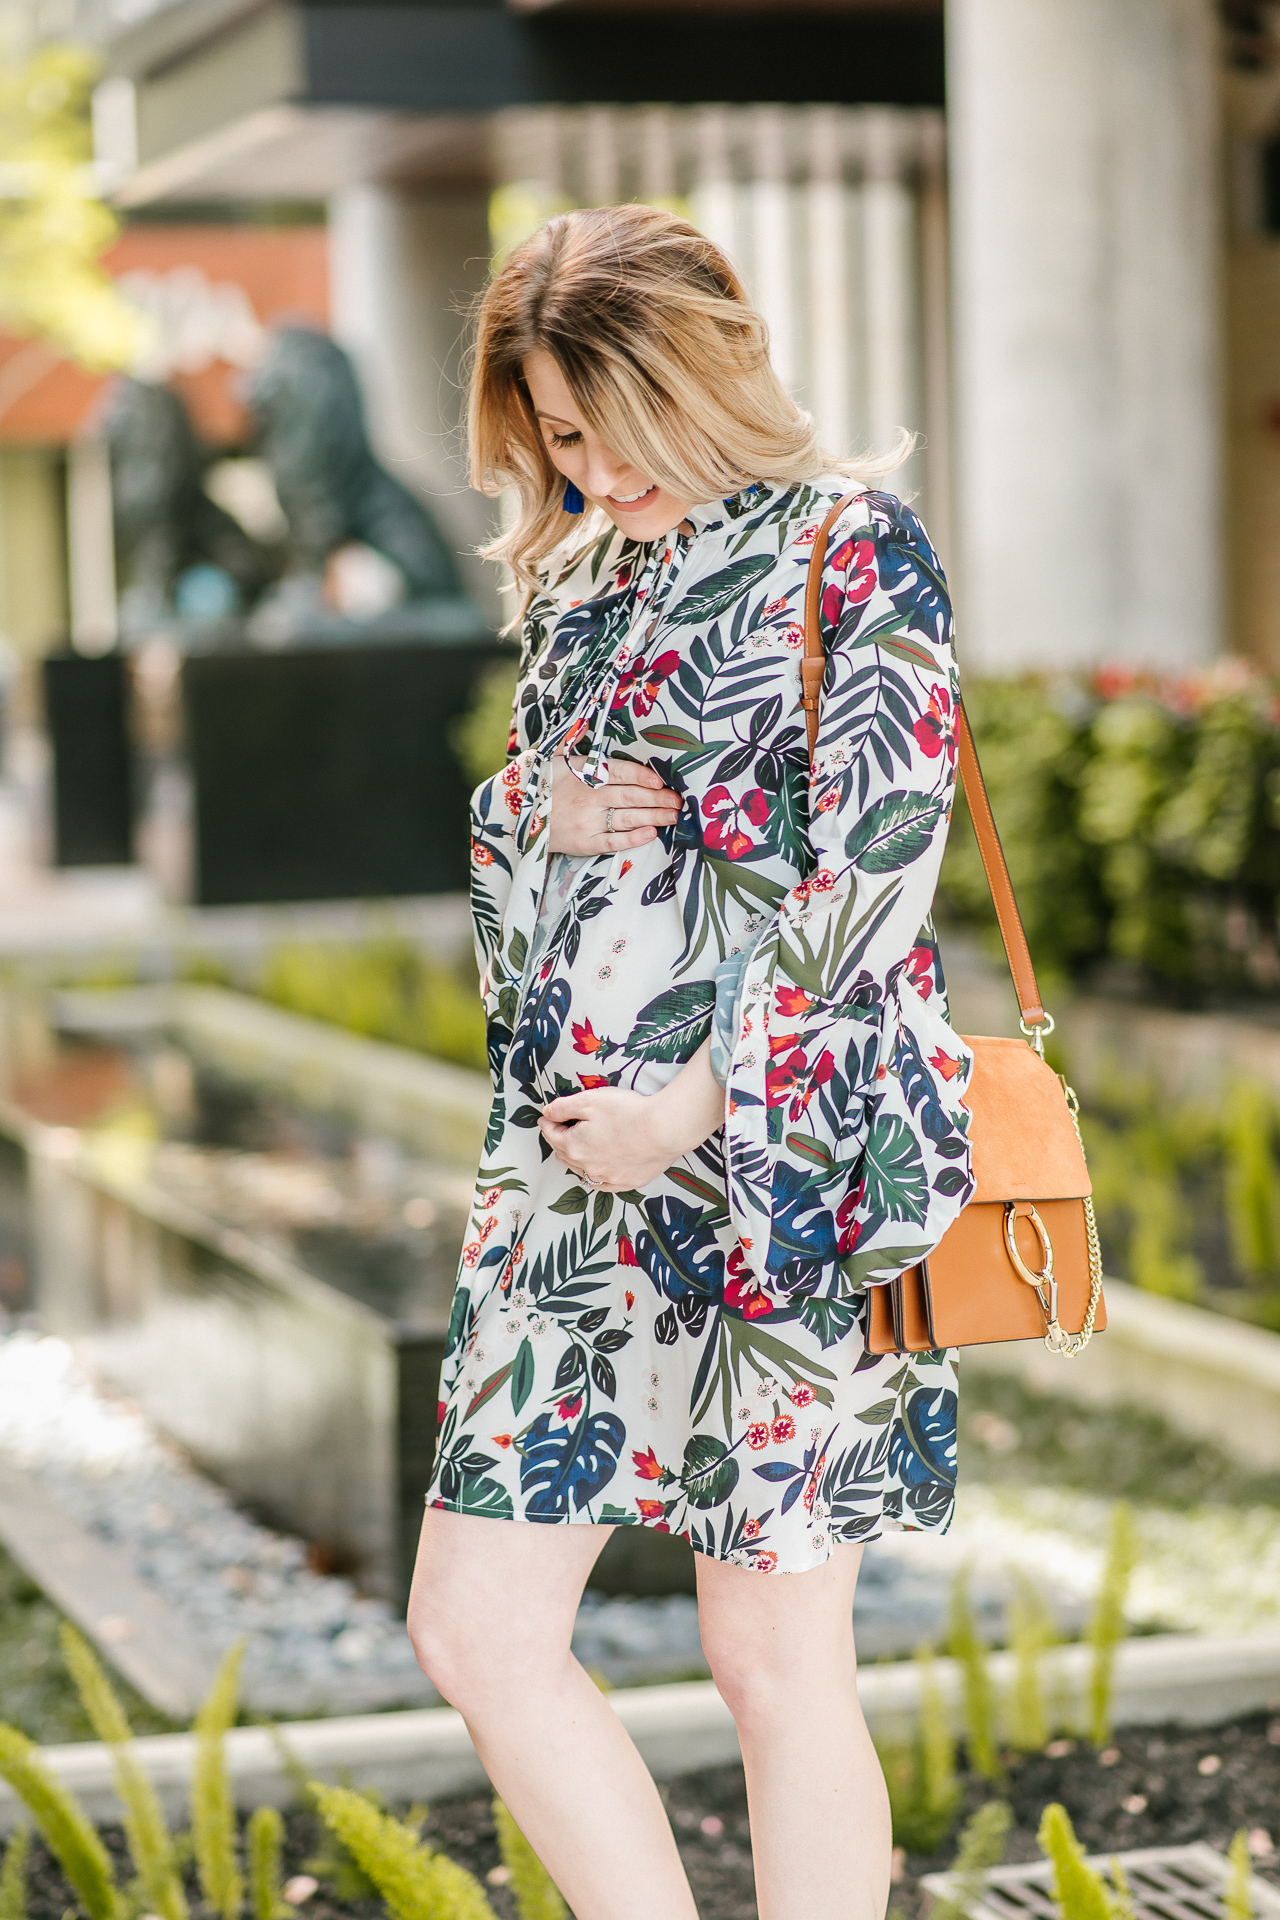 spring dress, swing dress, trumpet sleeve dress, floral dress, shein, fashion blogger, houston blogger, style blog